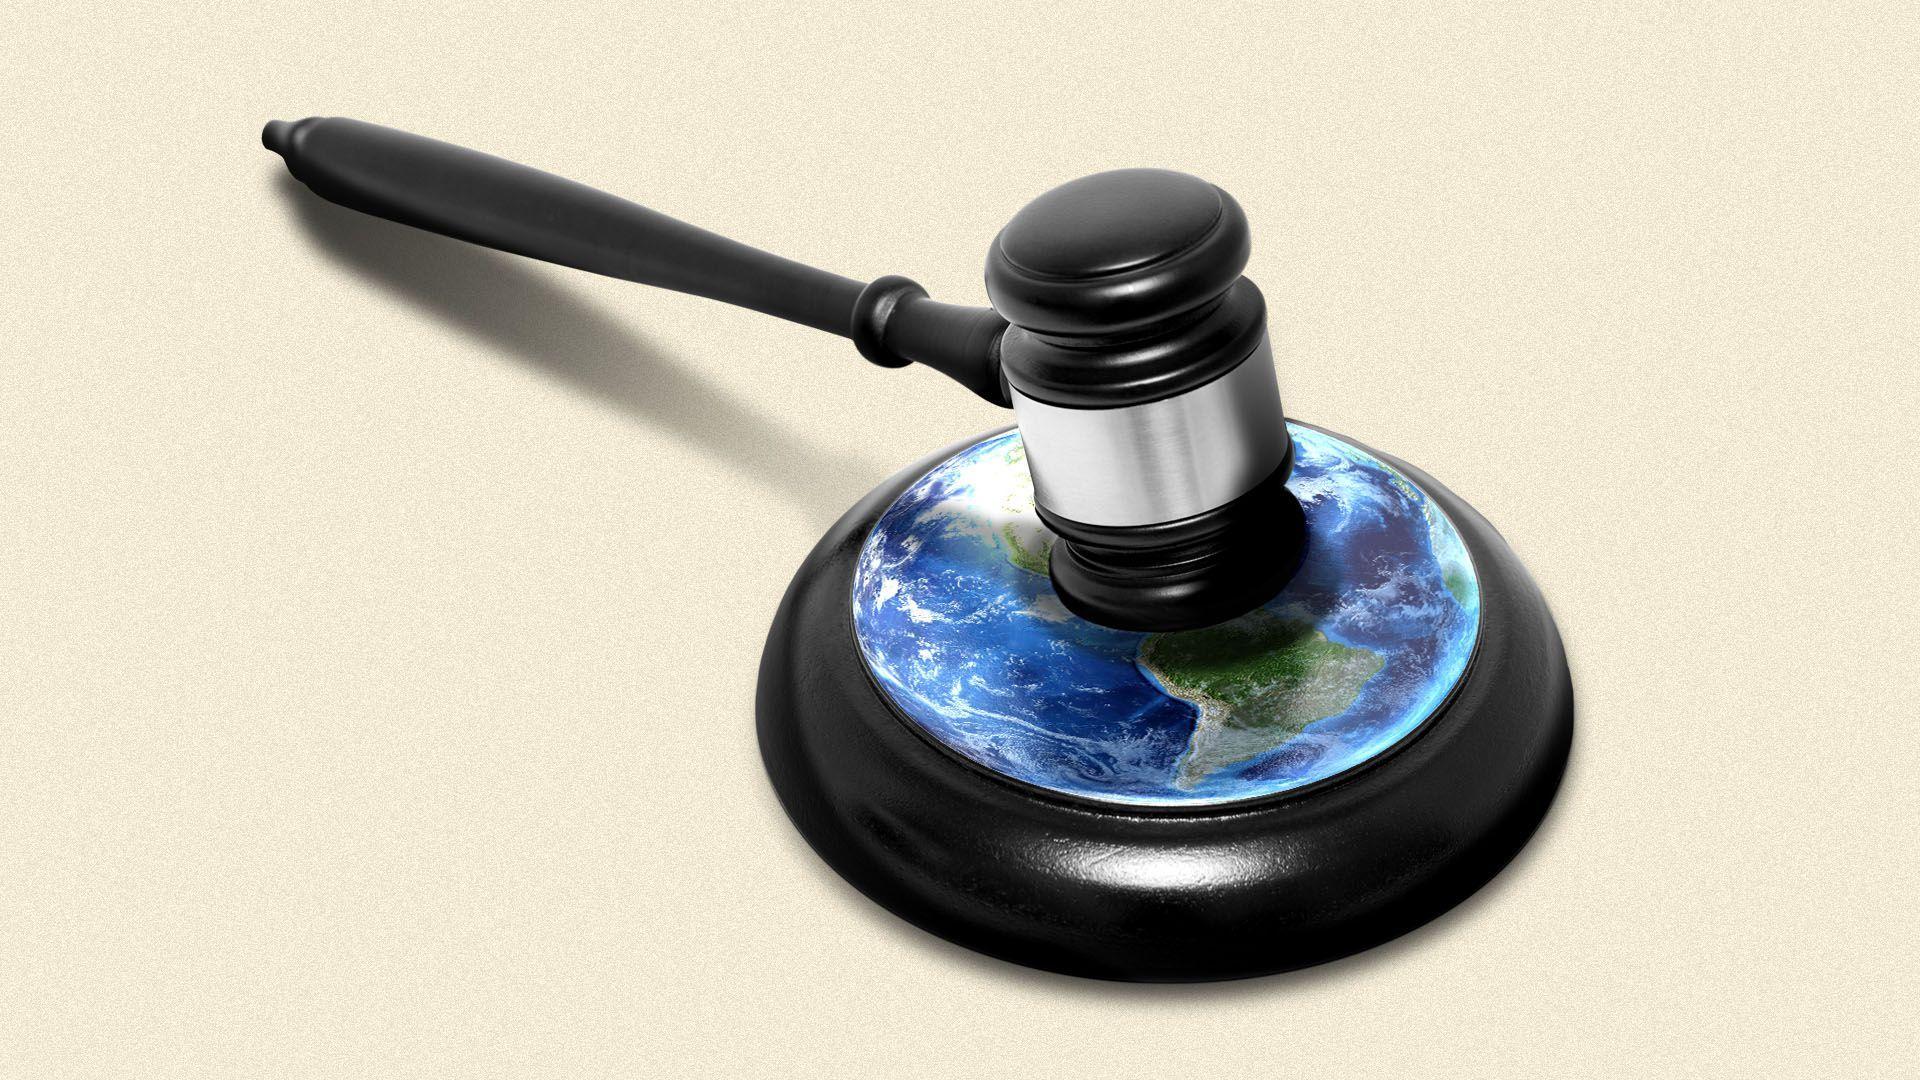 Illustration of a gavel hitting Earth